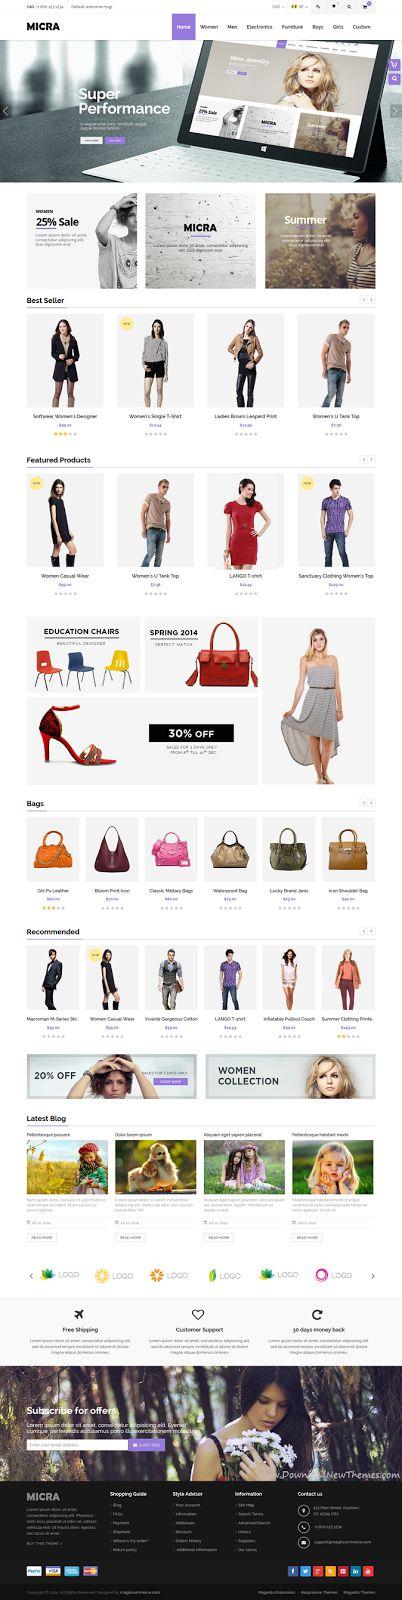 Awesome New Responsive Multipurpose #Magento Theme #inspiration #fashion #store #eCommerce #webdesign